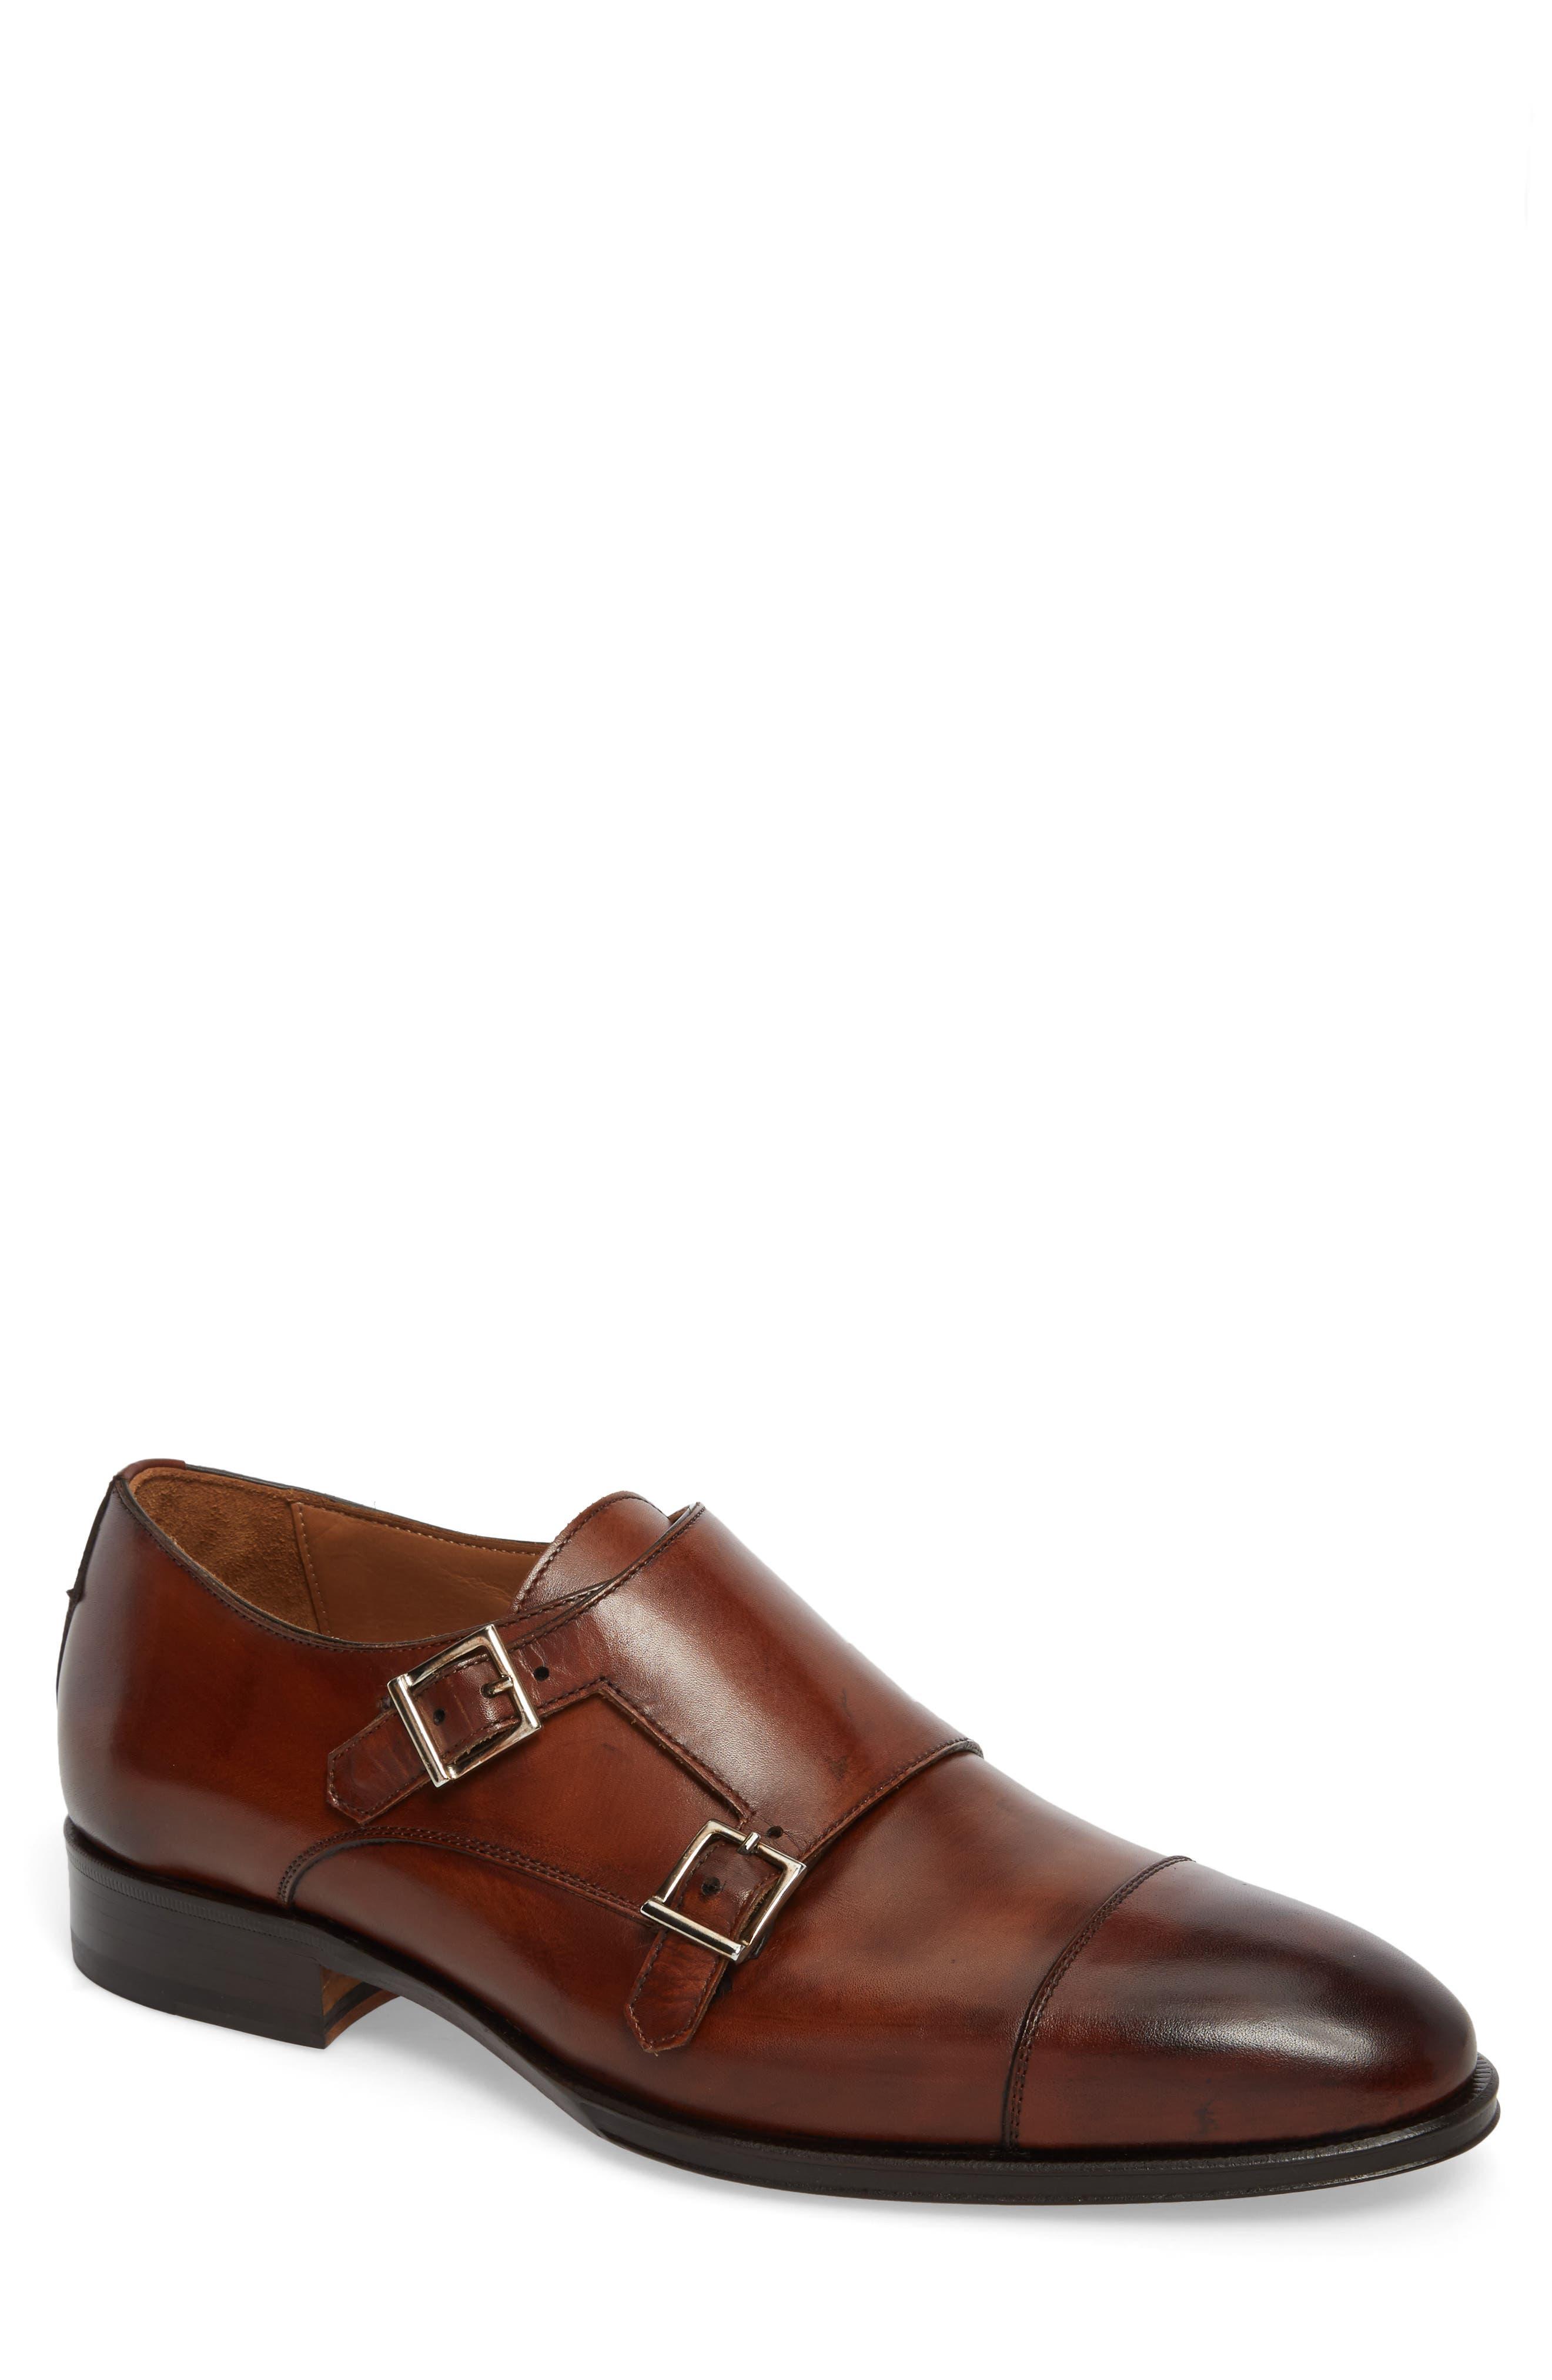 Gallo Bianco Double Monk Strap Shoe,                         Main,                         color, 201